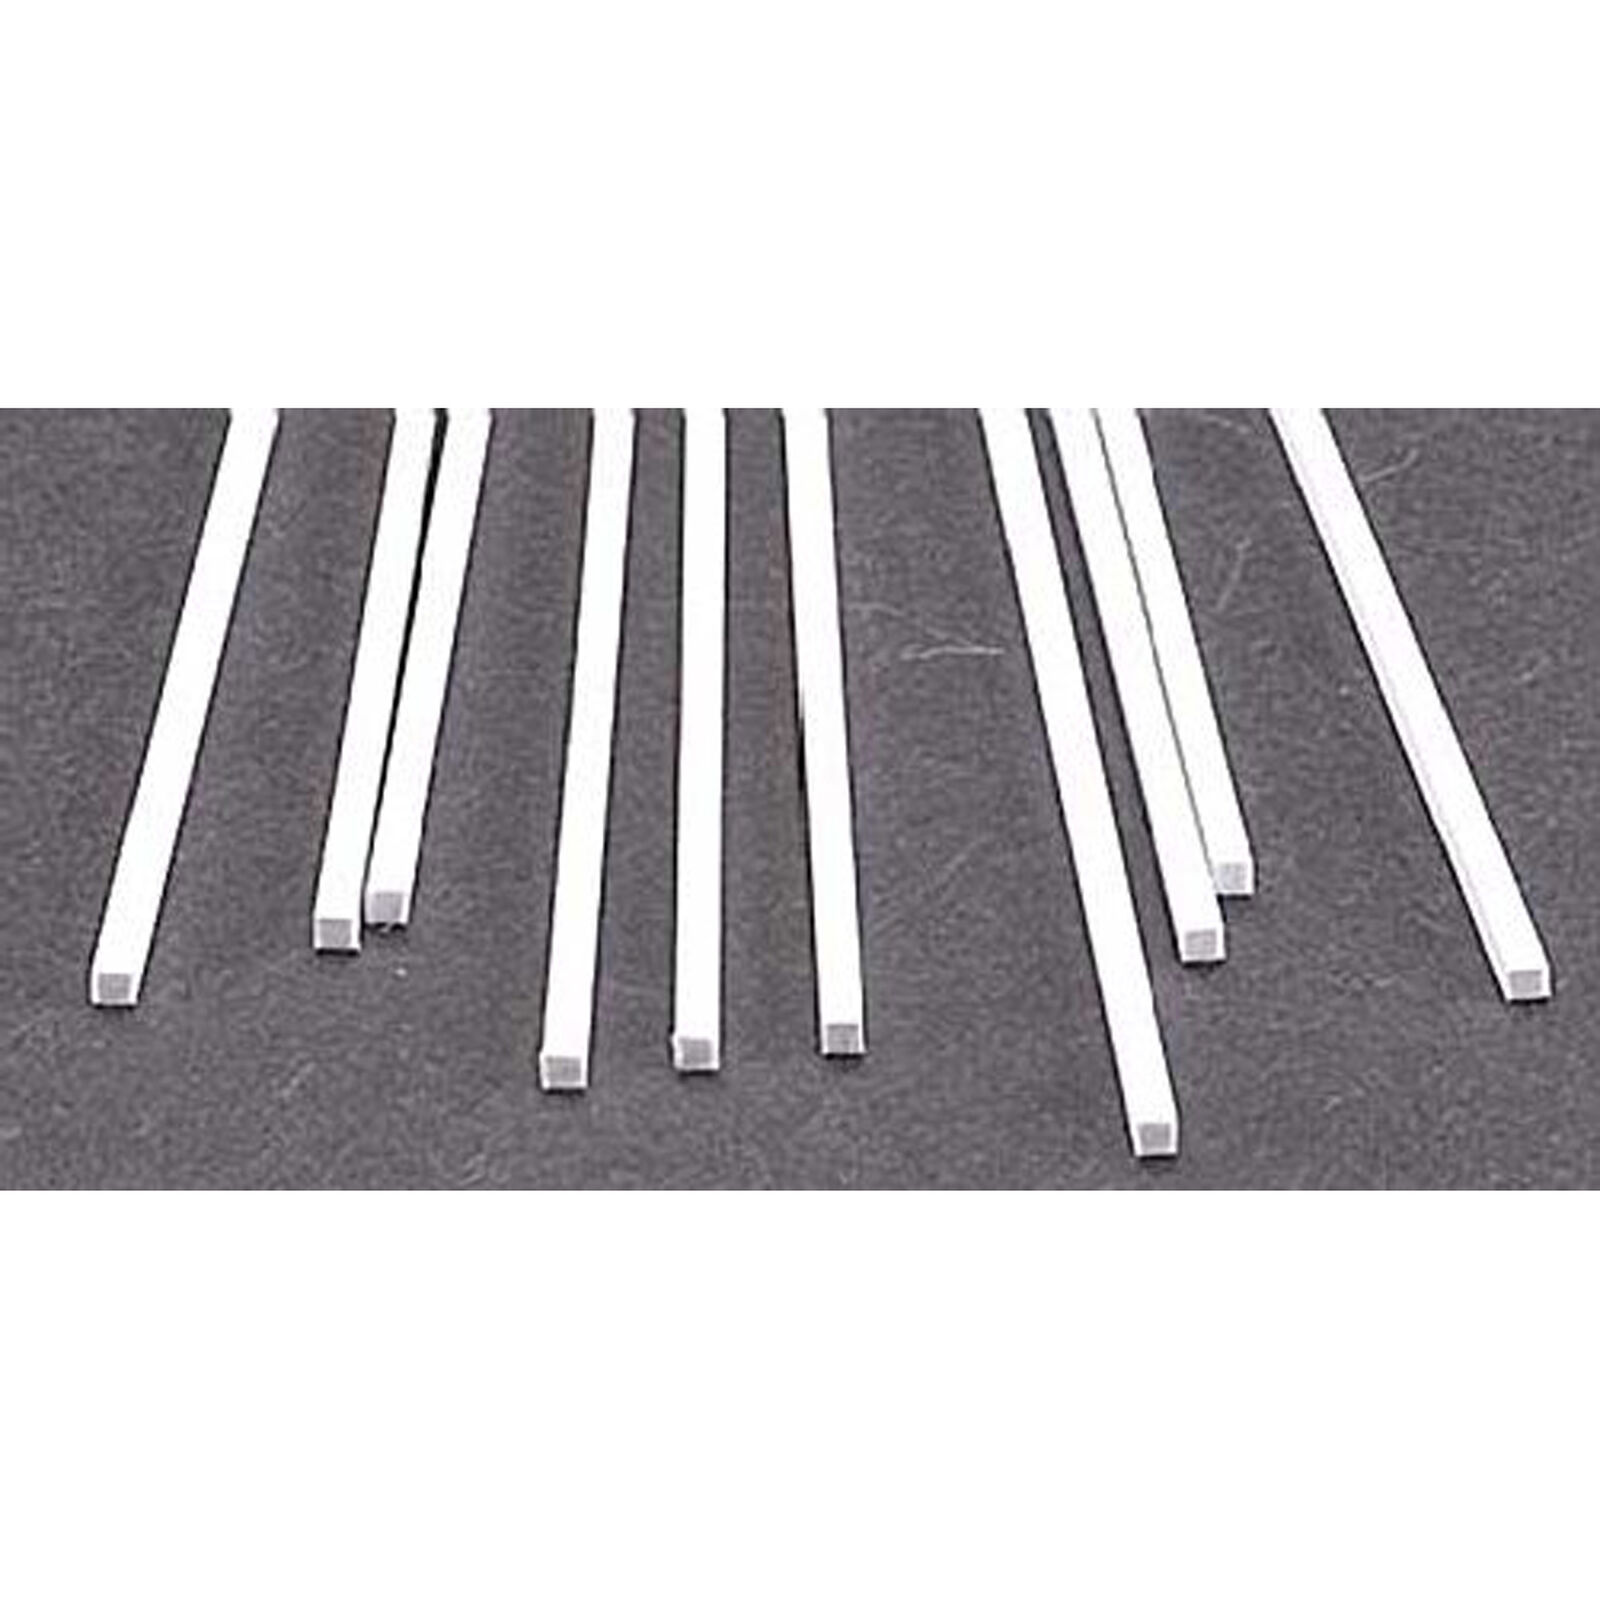 MS-100 Square Rod,.100 (10)